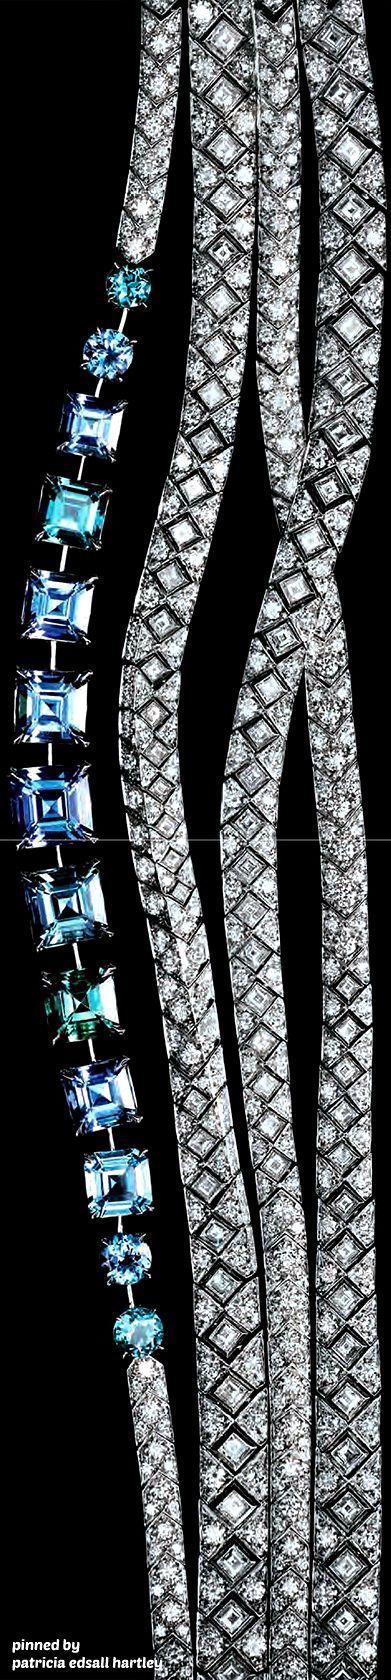 Tiffany & Co. Blue Book 2016